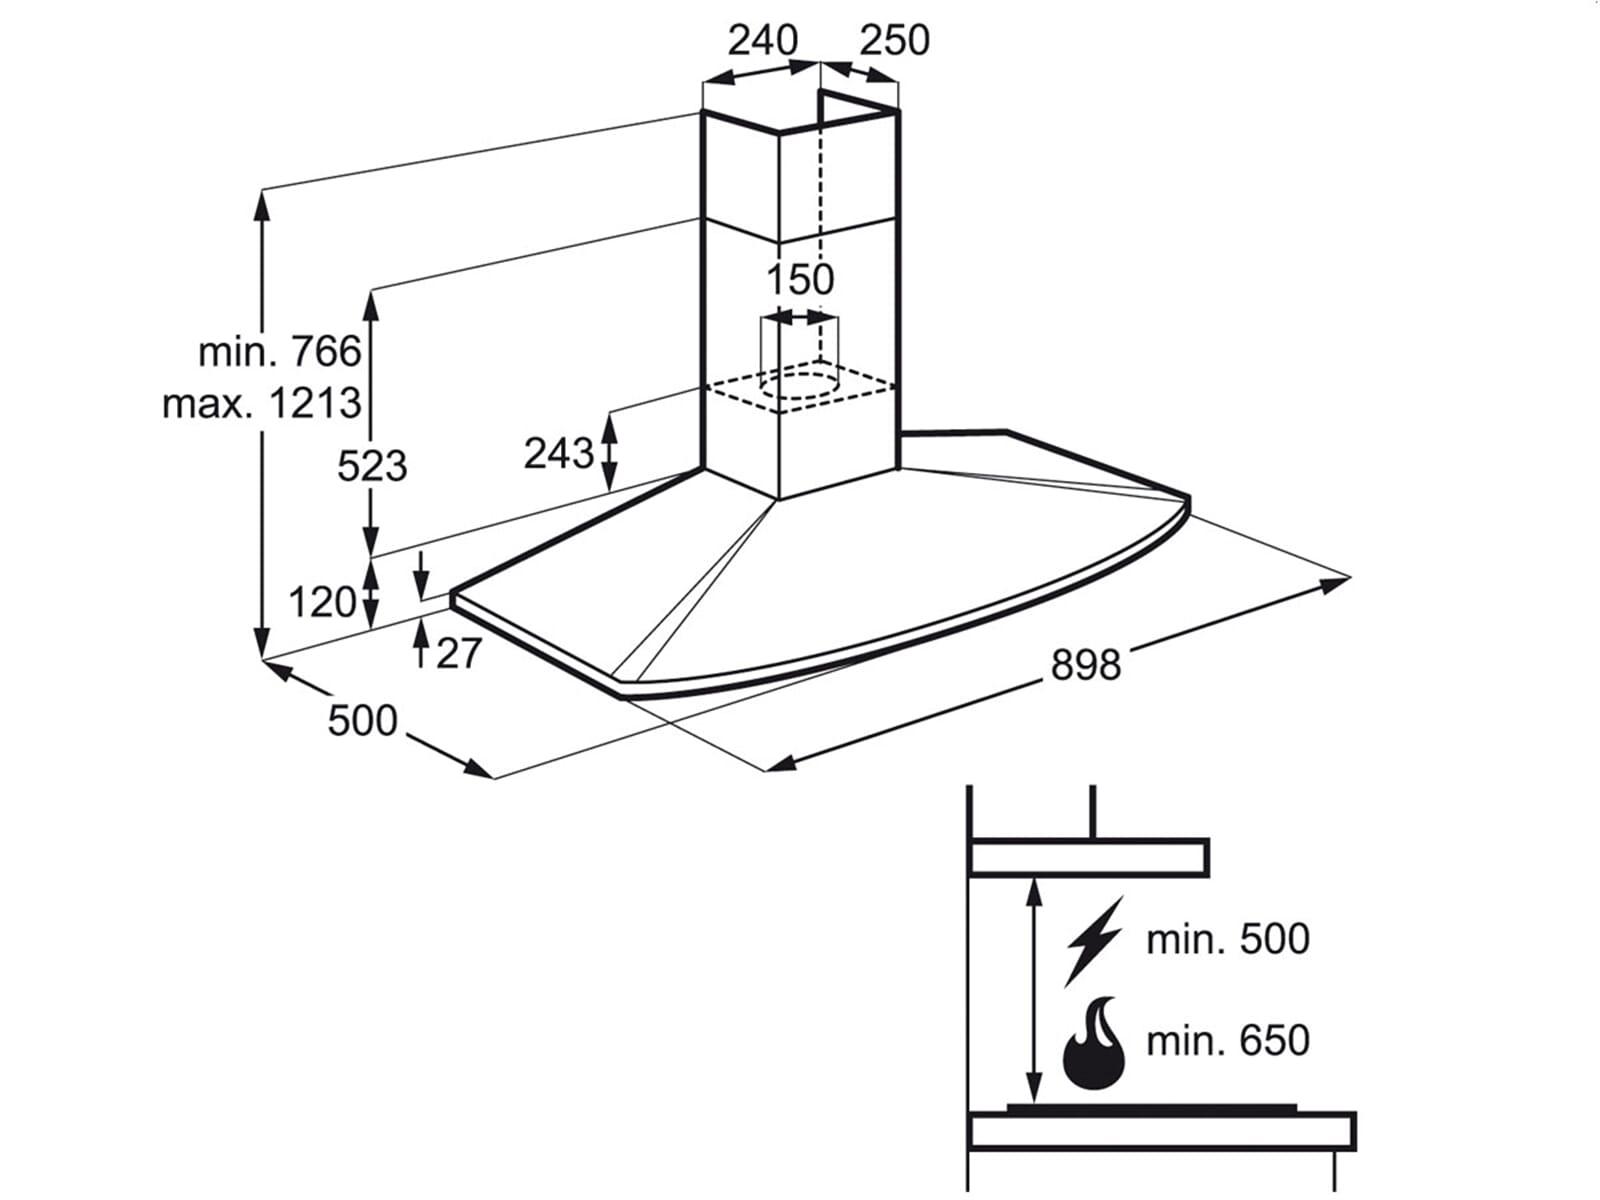 aeg electrolux efc90400x wand dunstabzugshaube edelstahl 90cm ebay. Black Bedroom Furniture Sets. Home Design Ideas